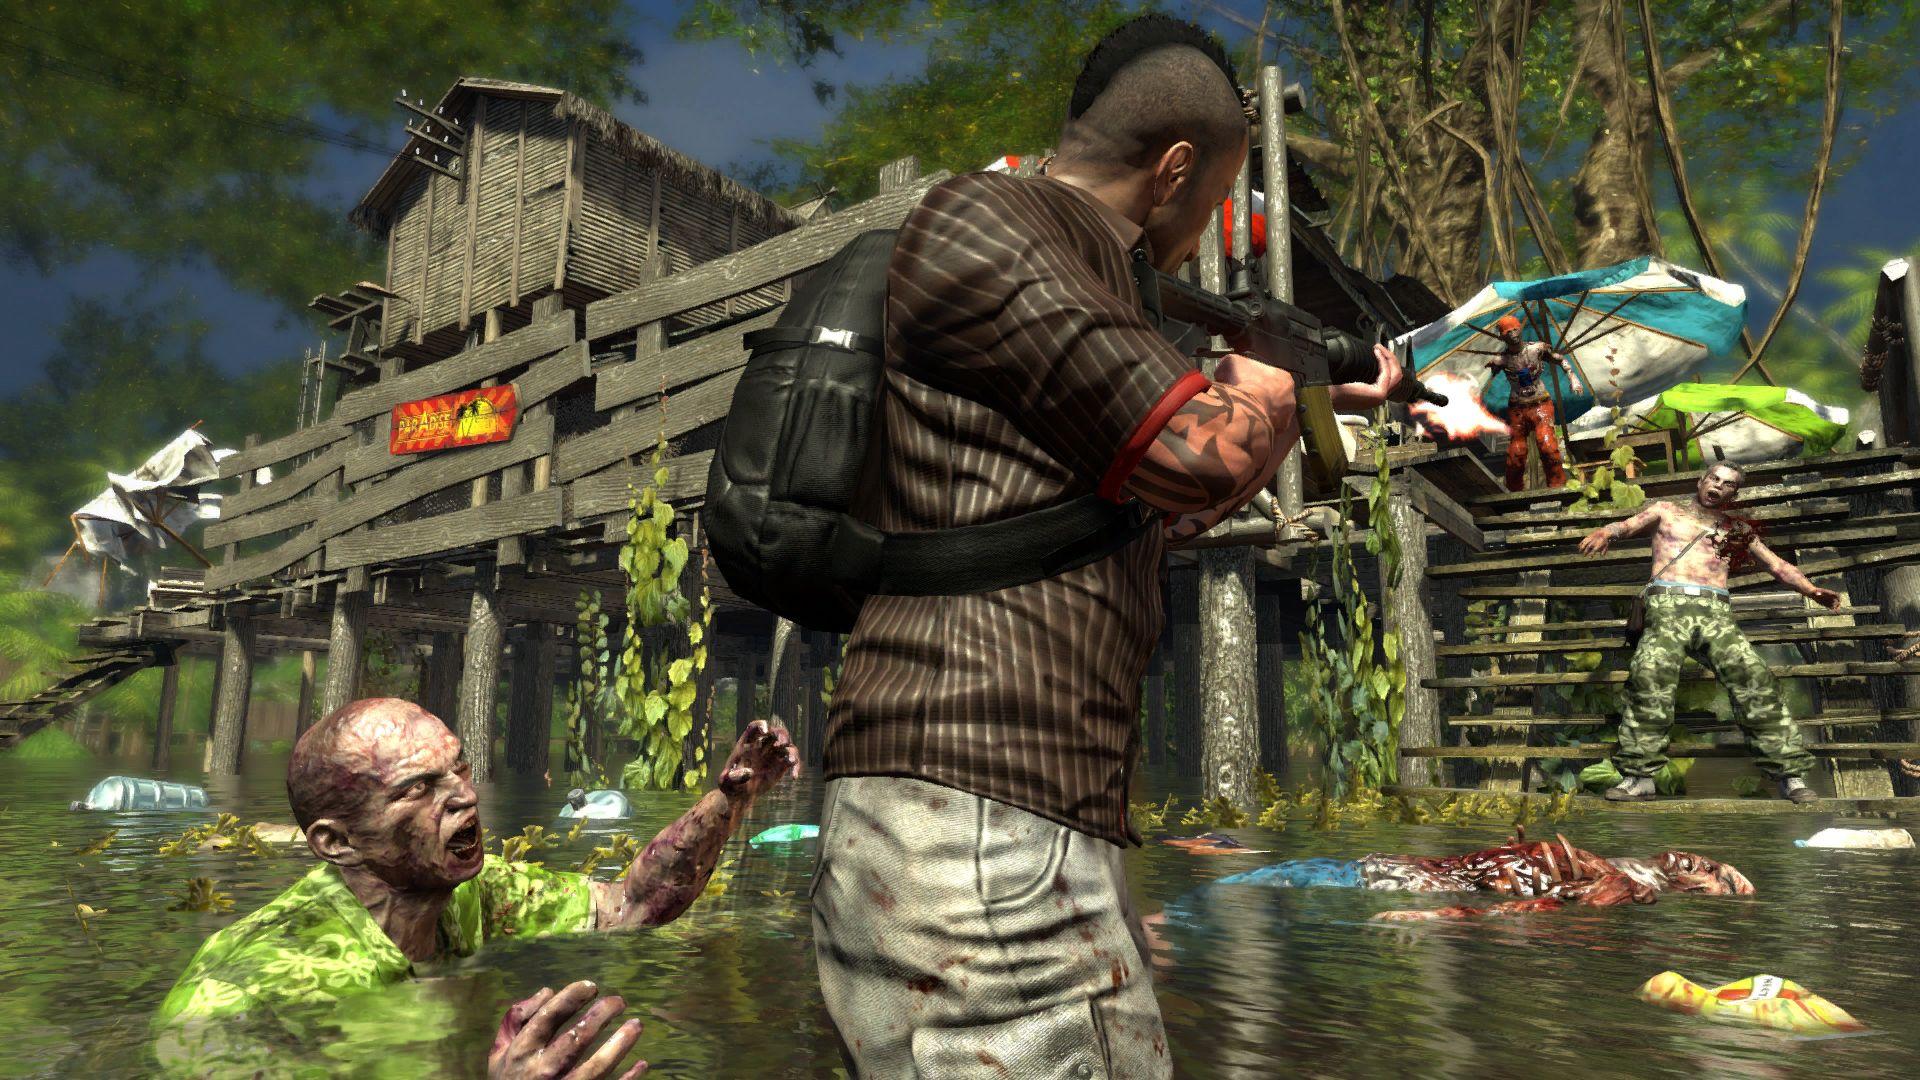 Dead Island Riptide Screenshot Jogos De Zumbi Borderlands Zumbi